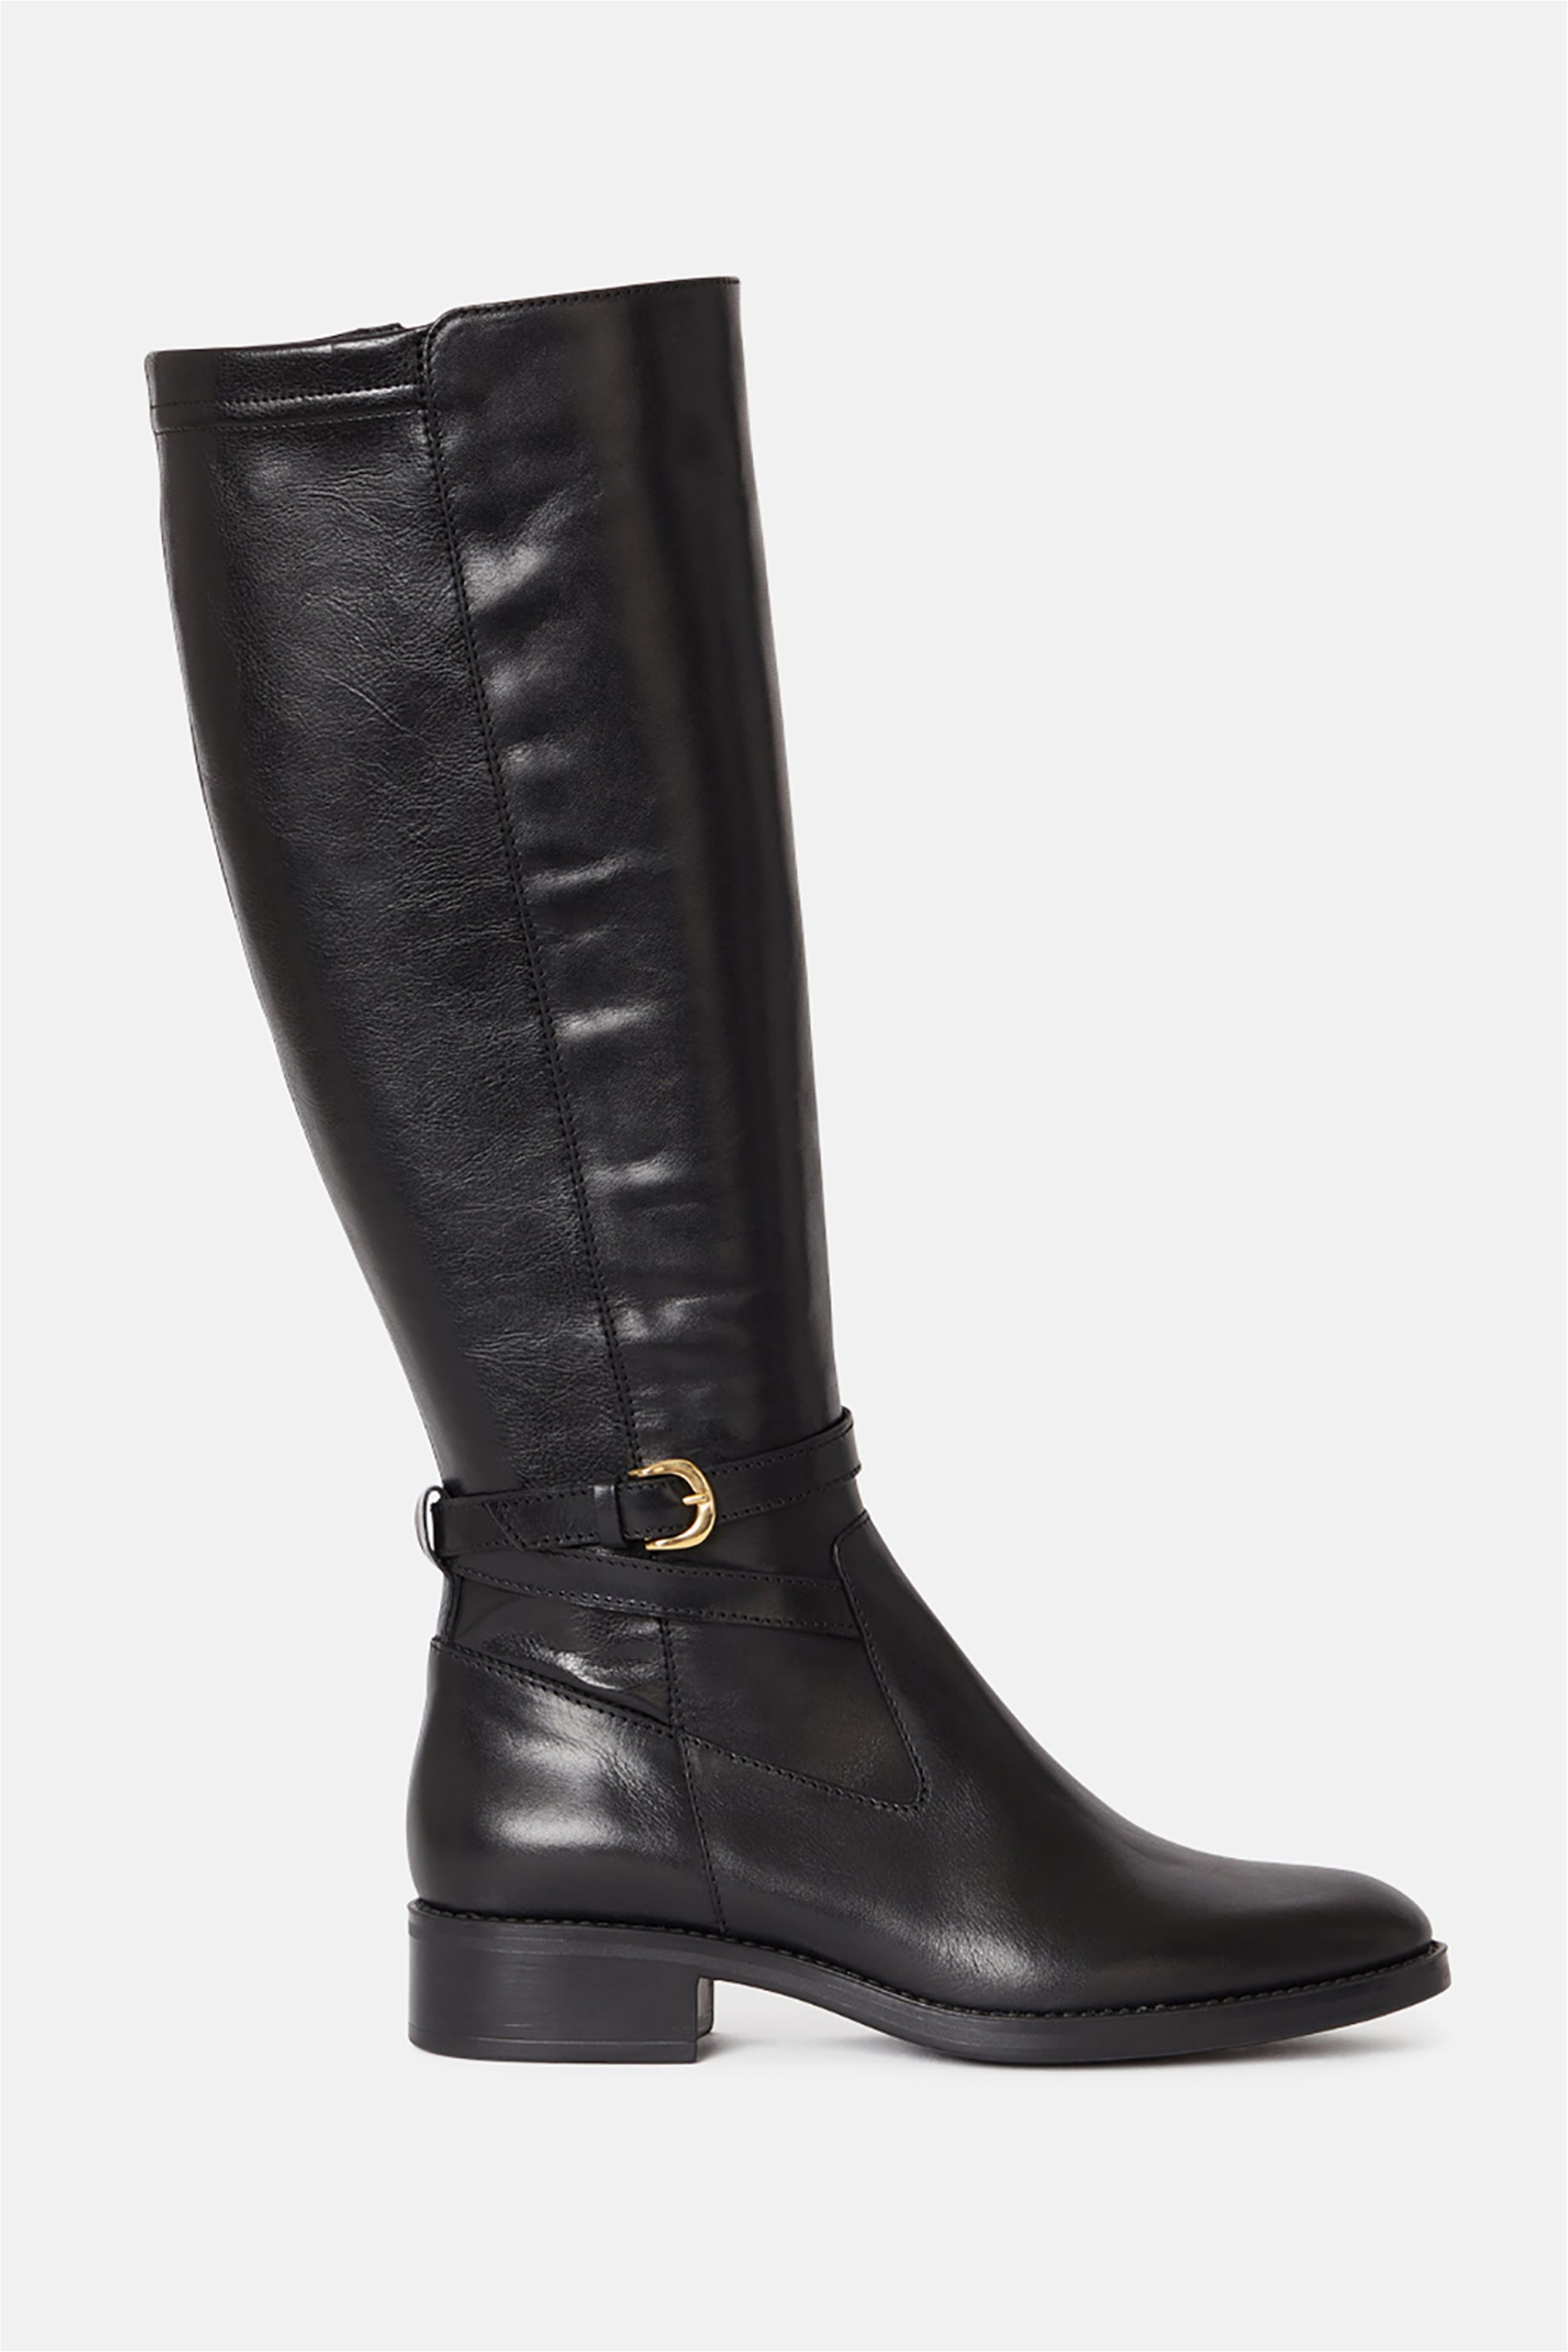 Minelli γυναικείες δερμάτινες μπότες «Madigane» – 828586 – Μαύρο